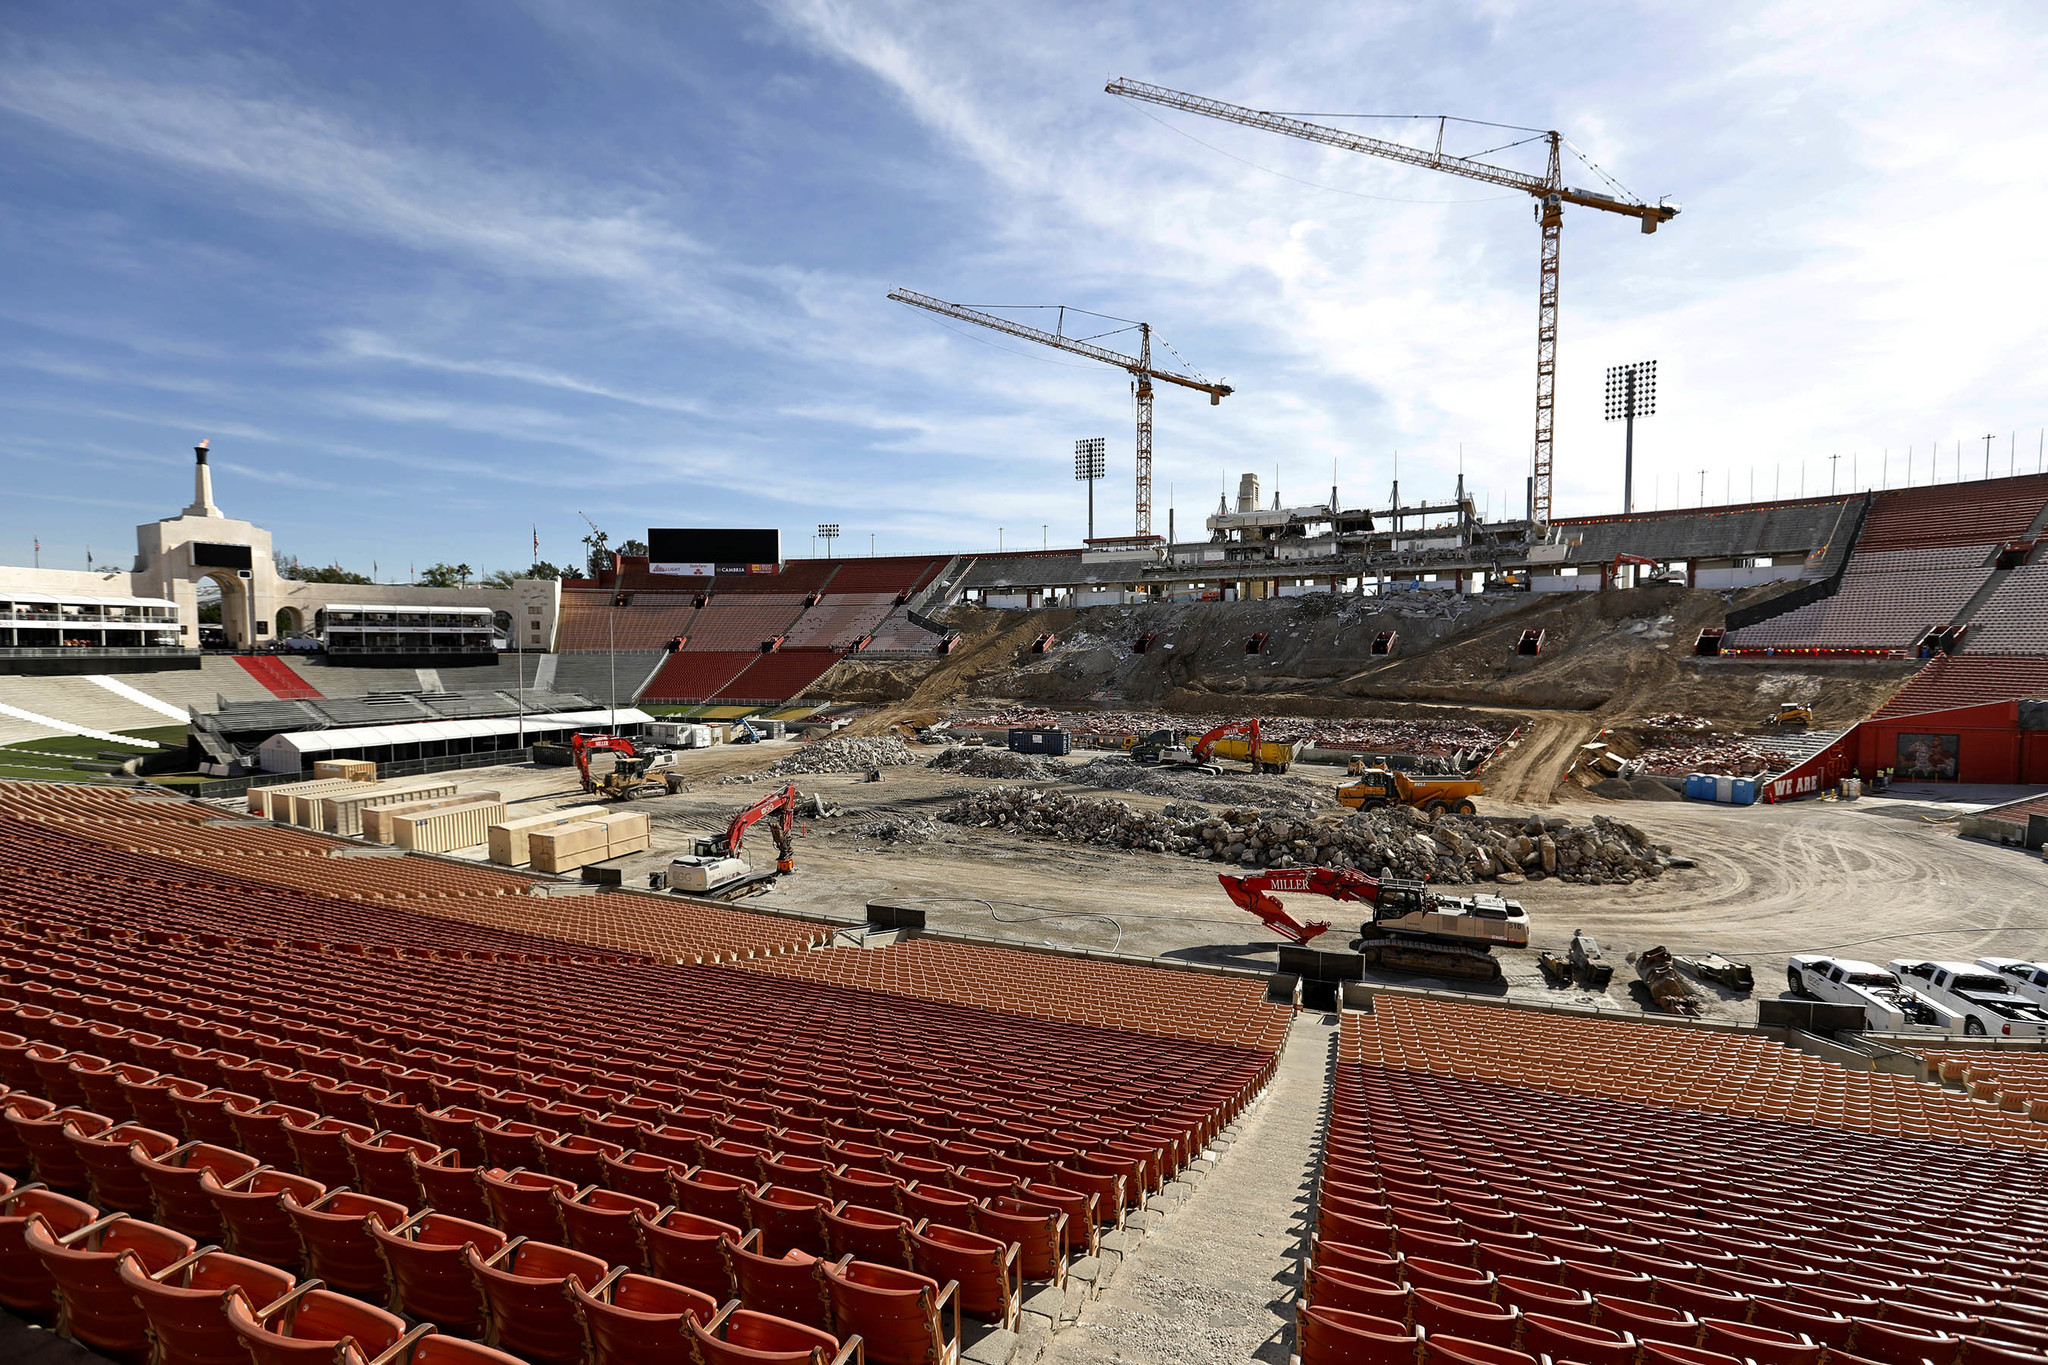 Jan. 29, 2018: Renovation work in progress at the United Airlines Memorial Coliseum.